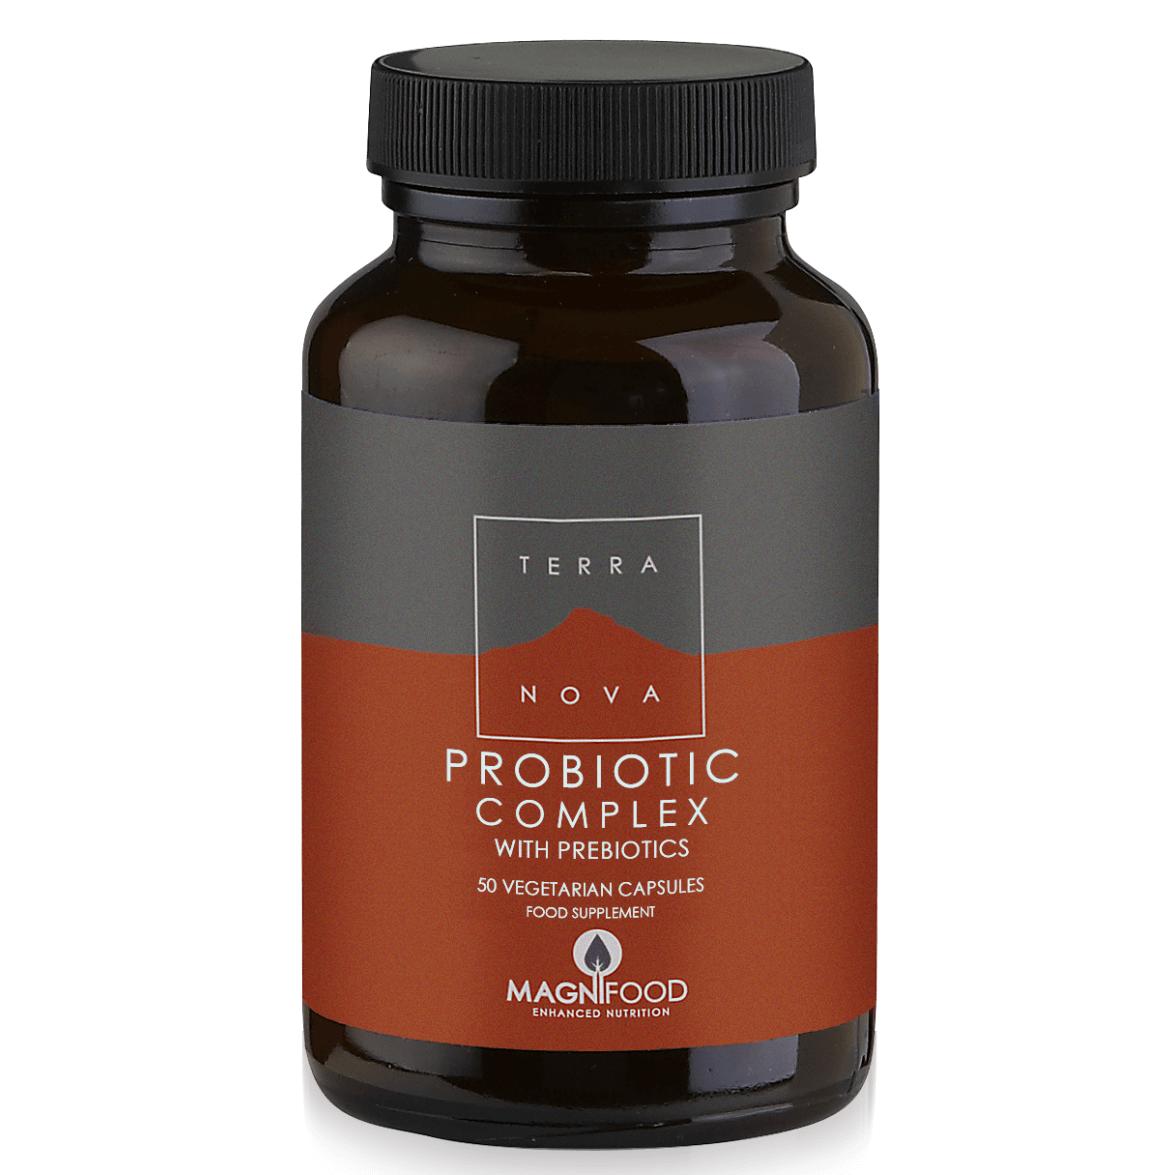 Terranova Probiotic Complex with Prebiotics Μοναδικός Συνδυασμός Προβιοτικών, Πρεβιοτικών με Μέγιστη Αποτελεσματικότητα 50Caps